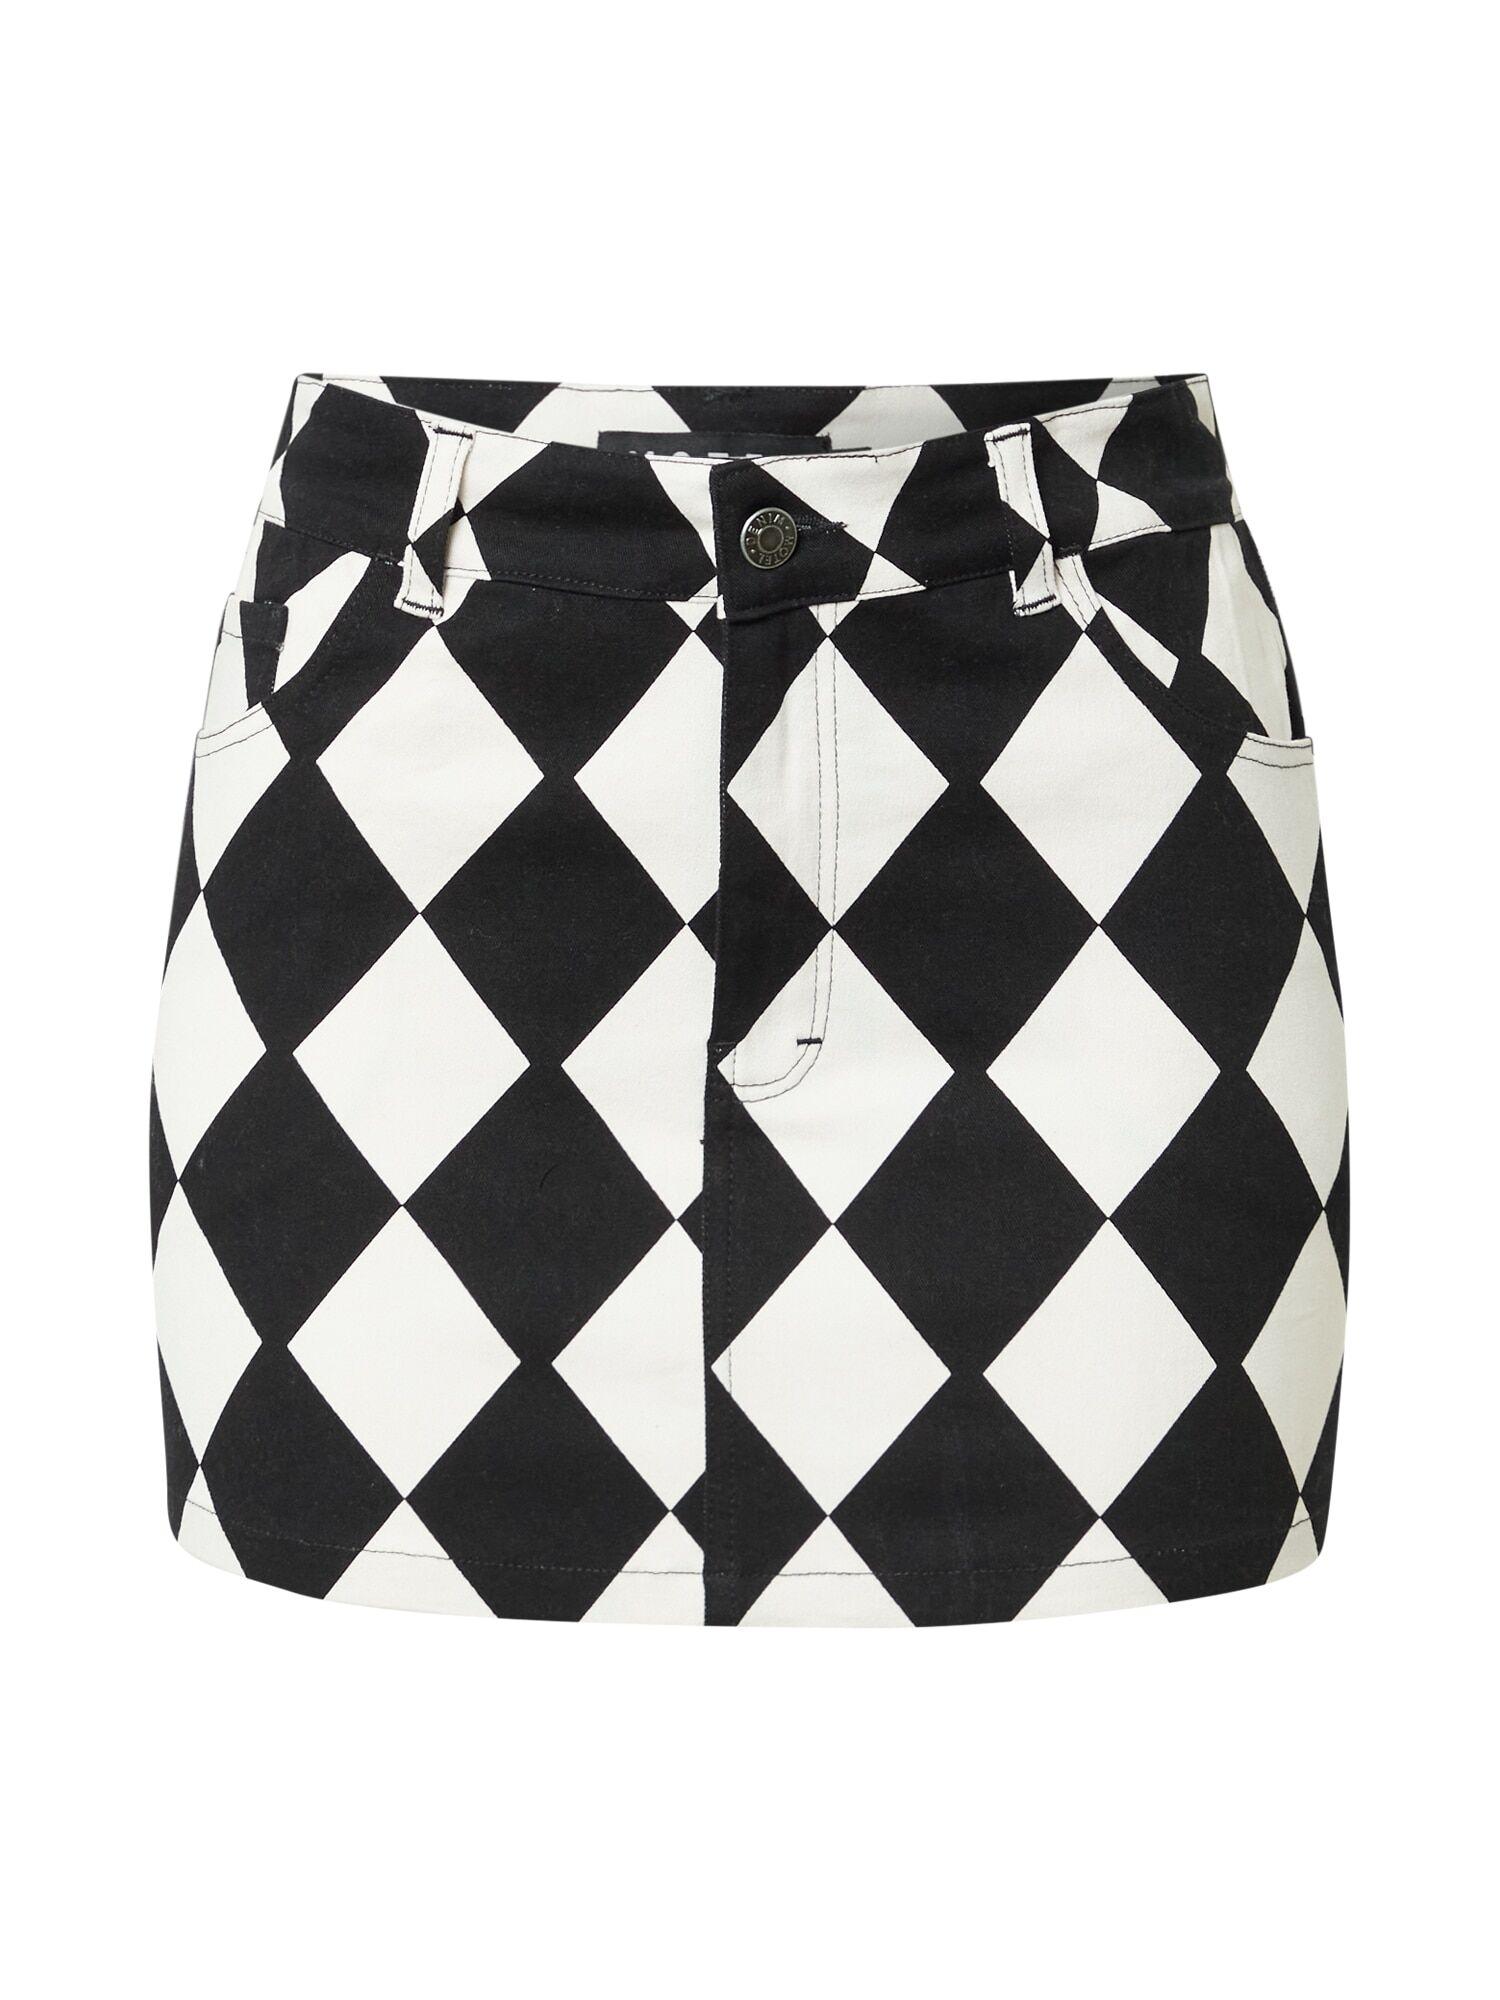 Motel Jupe 'Micro Broomy'  - Noir, Blanc - Taille: XXS - female